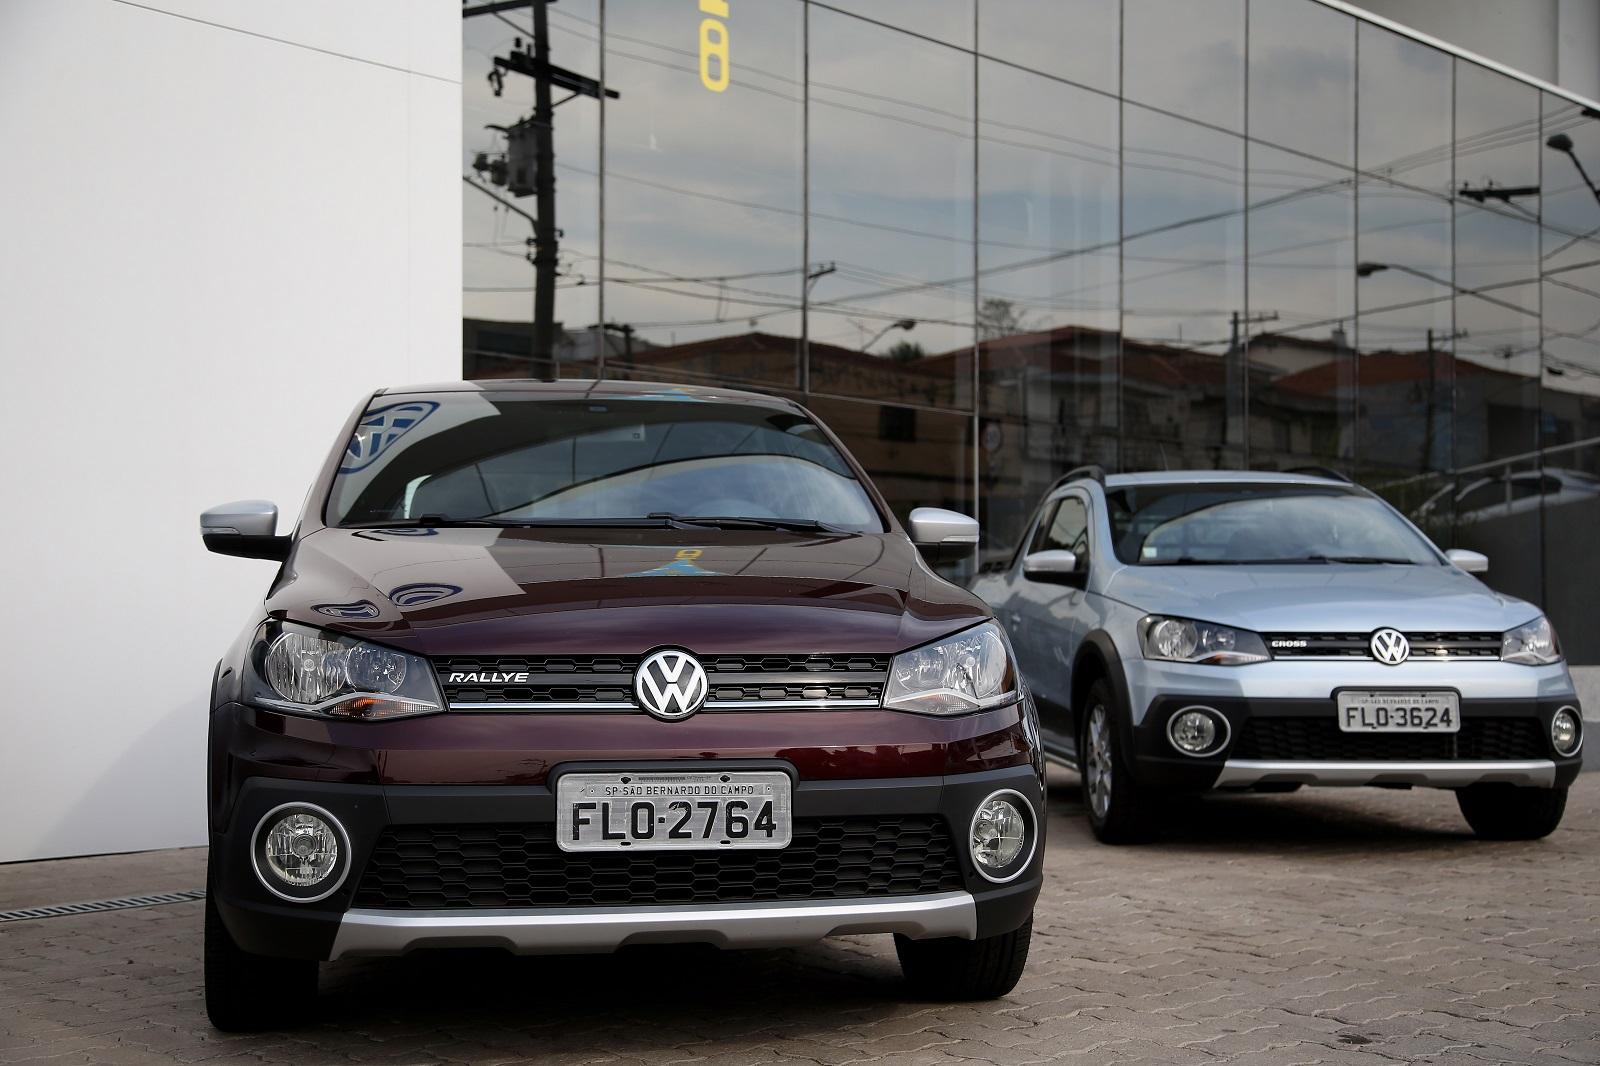 driving entirely on ethanol brazil s volkswagen gol flex fuel vehicle. Black Bedroom Furniture Sets. Home Design Ideas